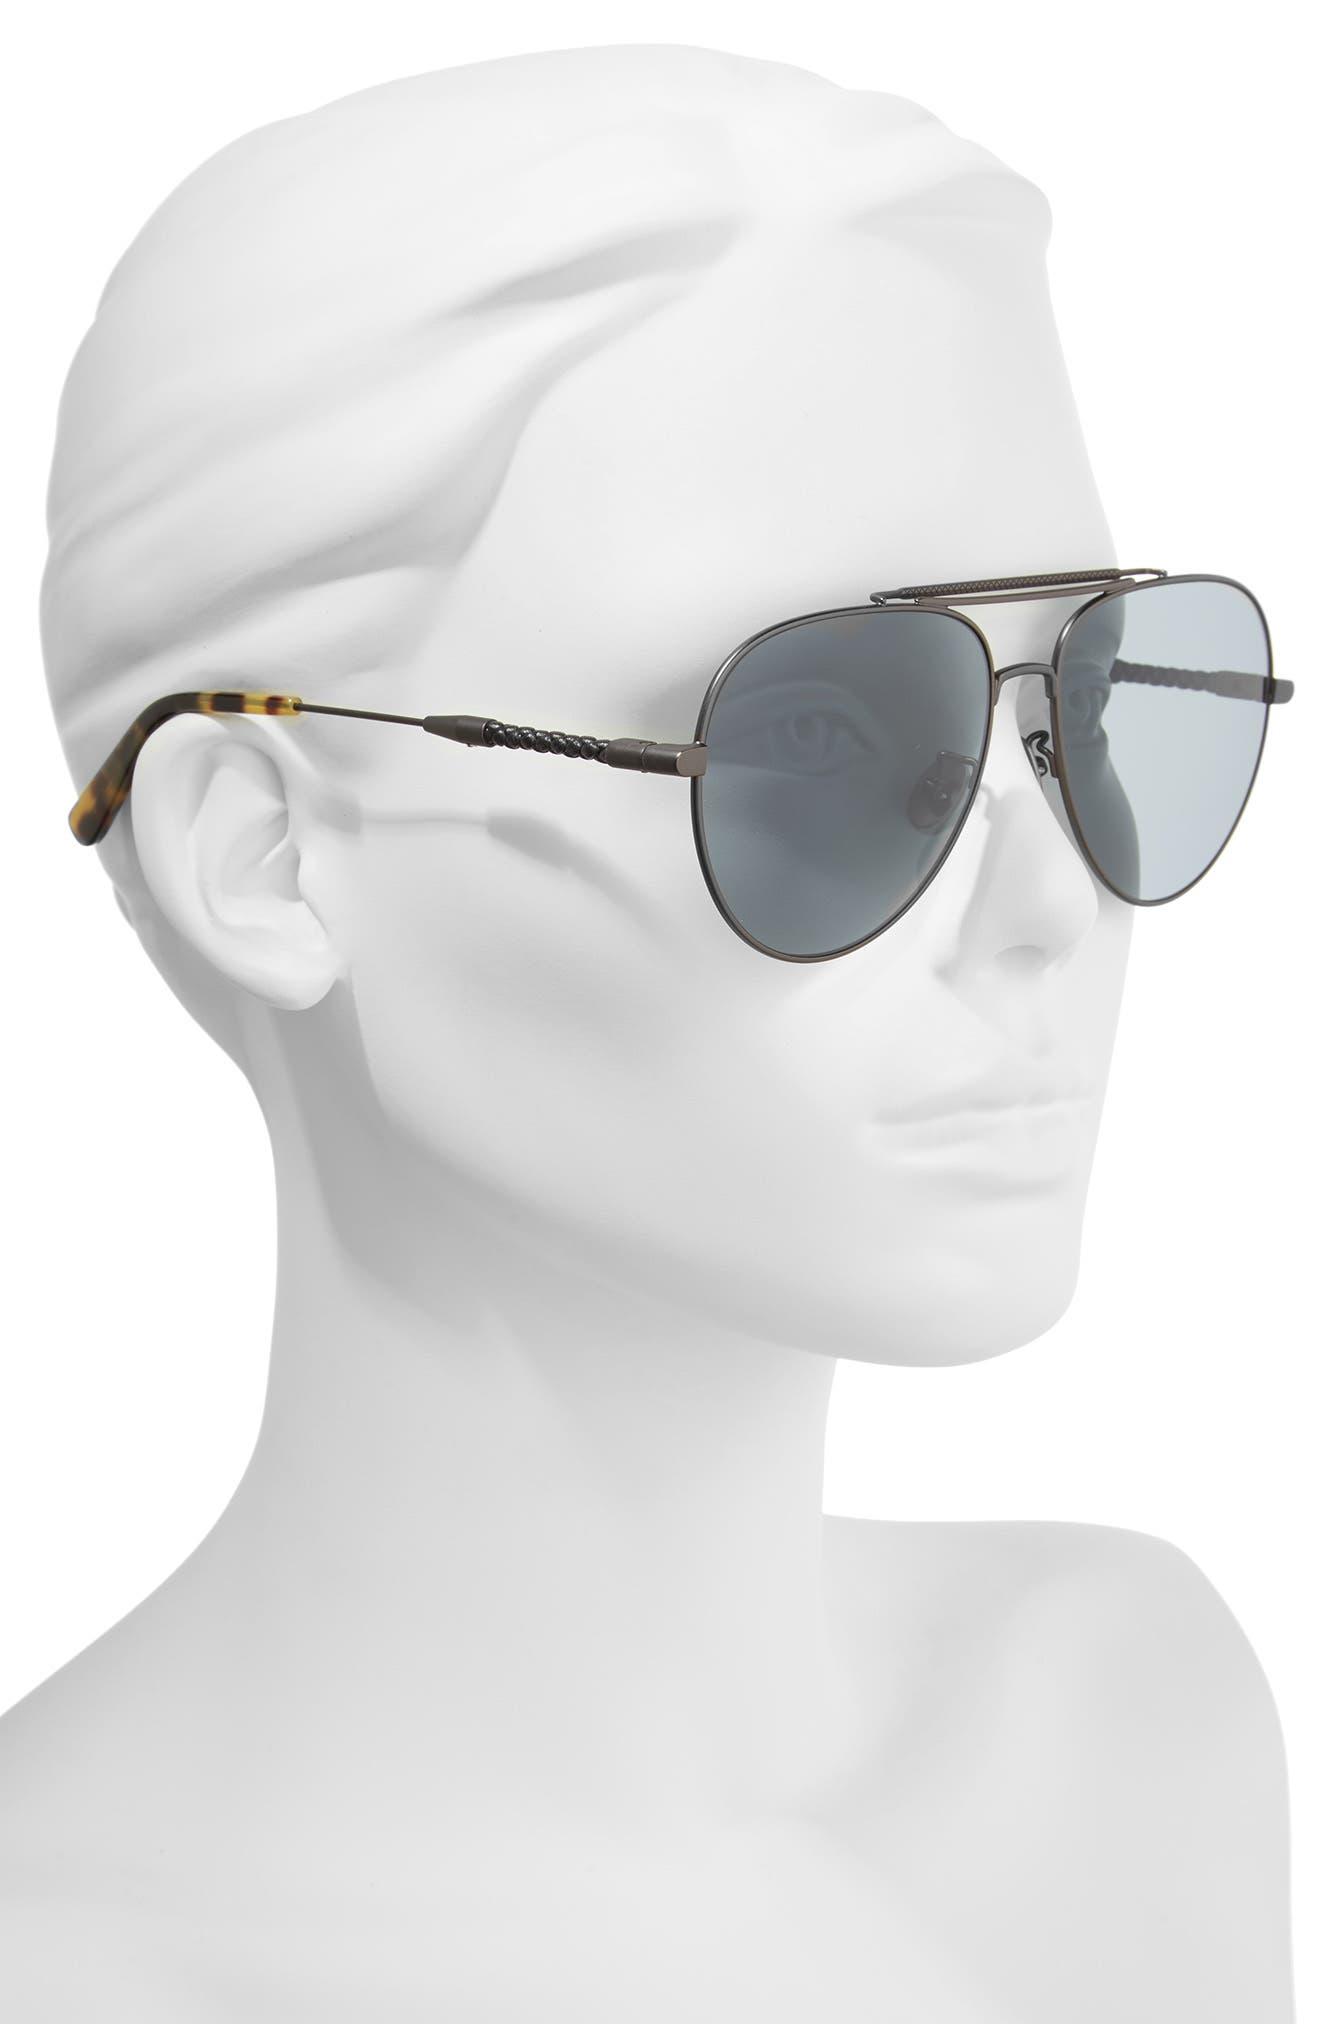 59m Polarized Aviator Sunglasses,                             Alternate thumbnail 2, color,